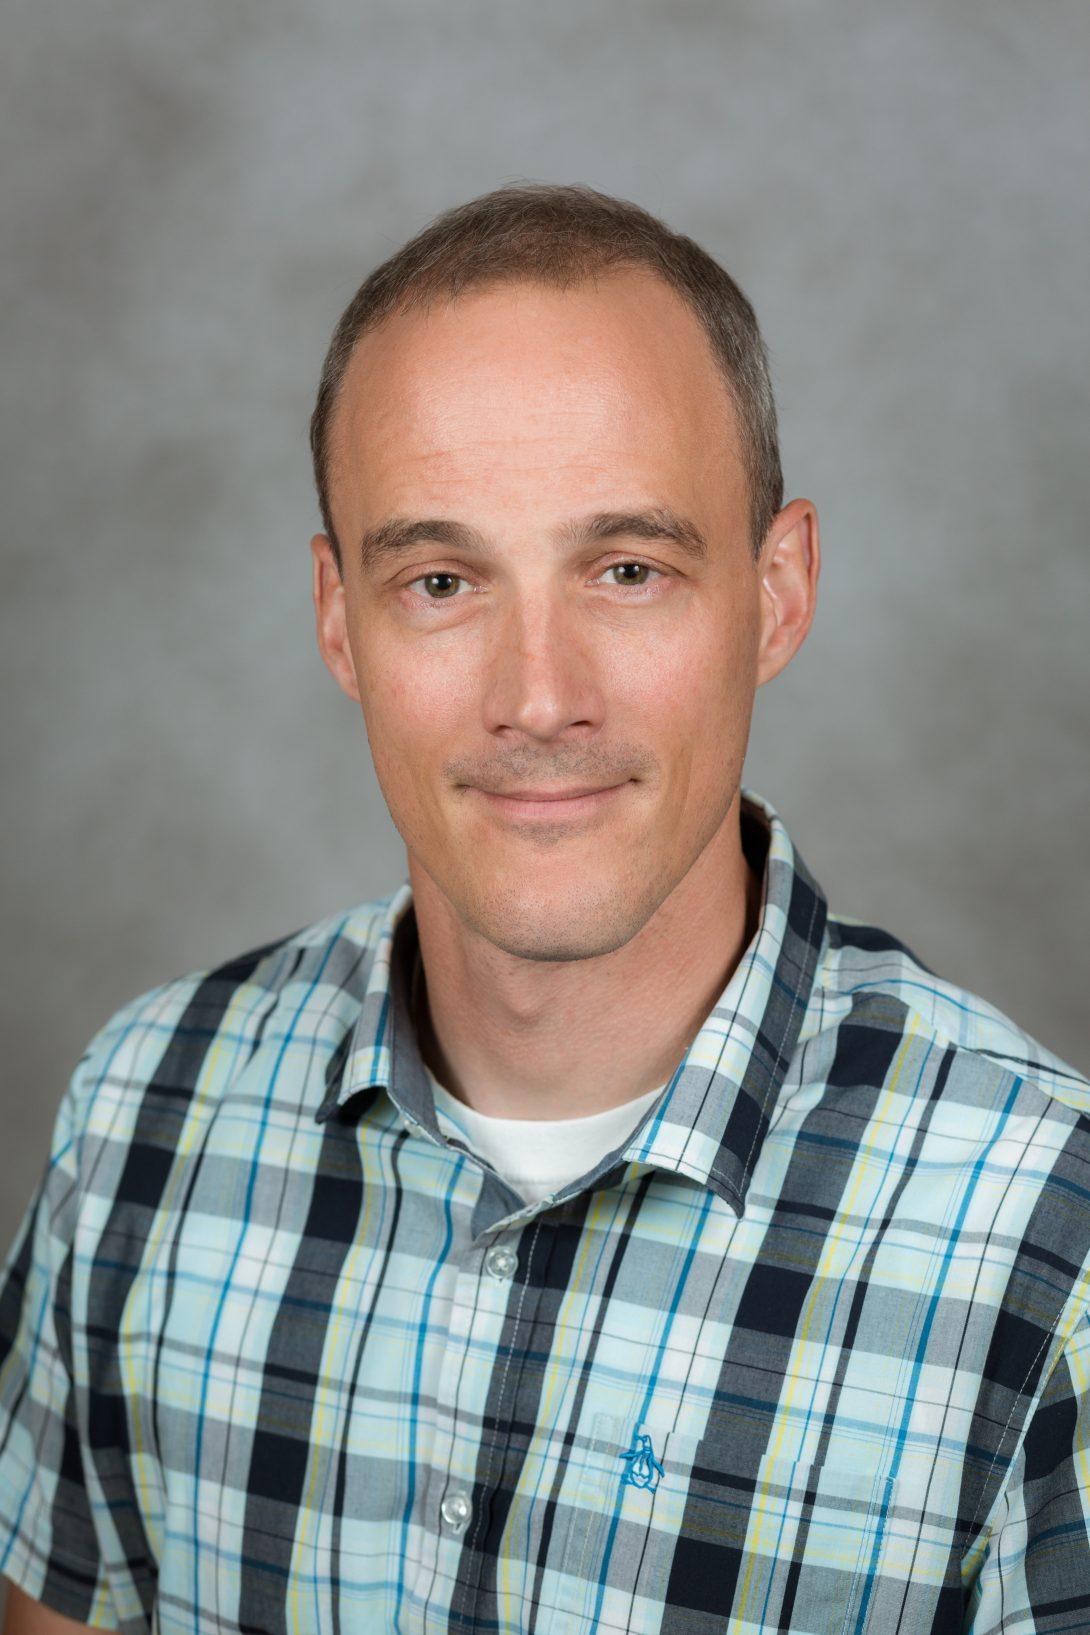 2021 Capstone Supervisor of the Year: Dr. Robert F Klie